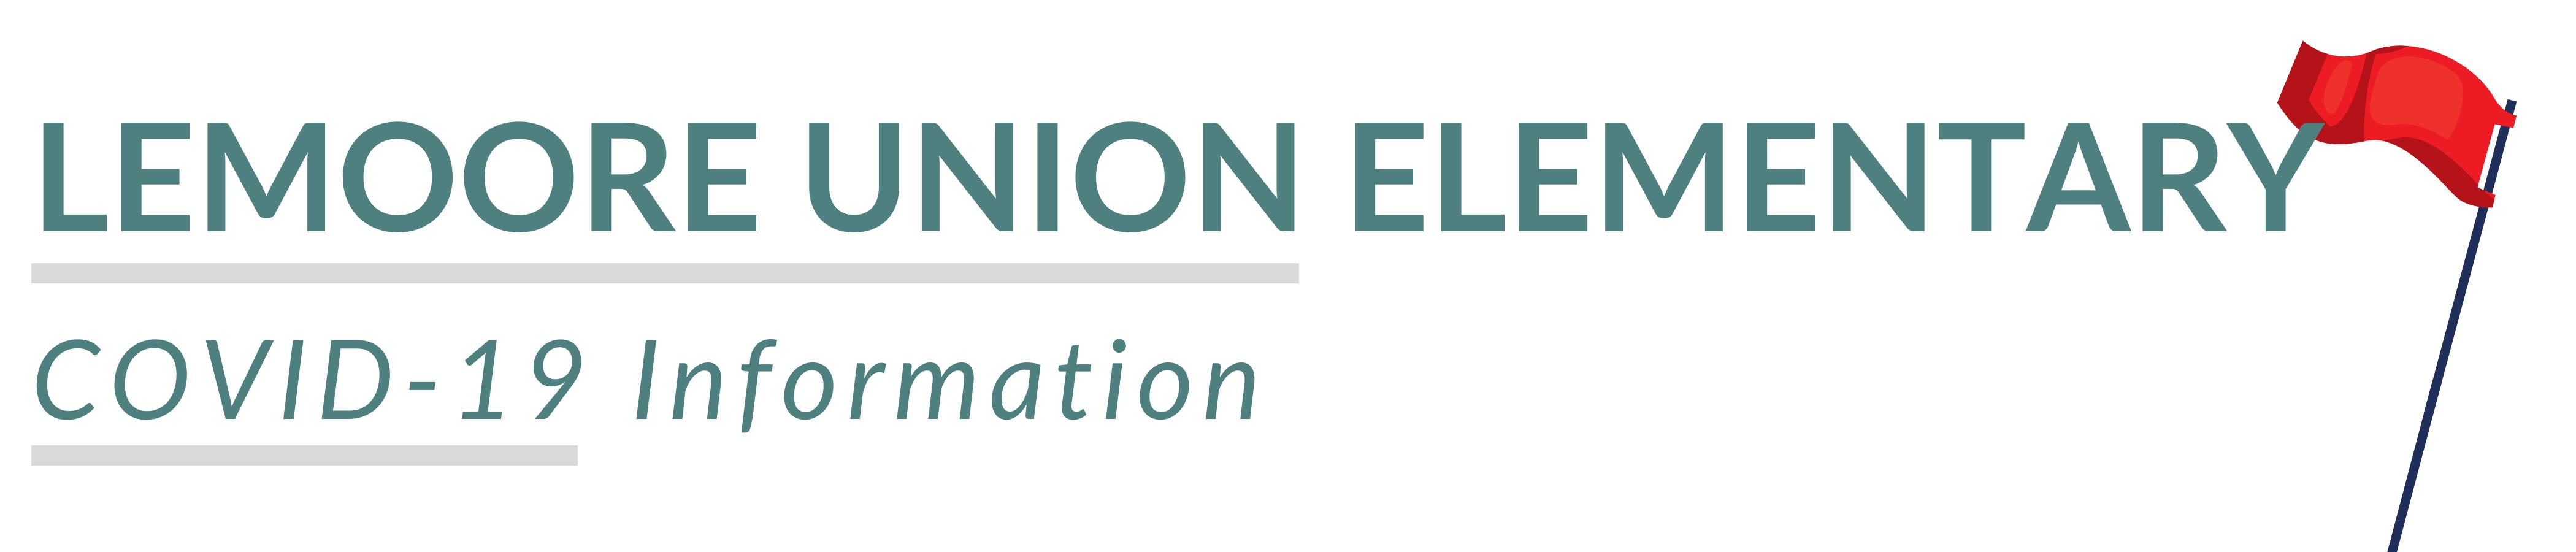 Lemoore Union Elementary